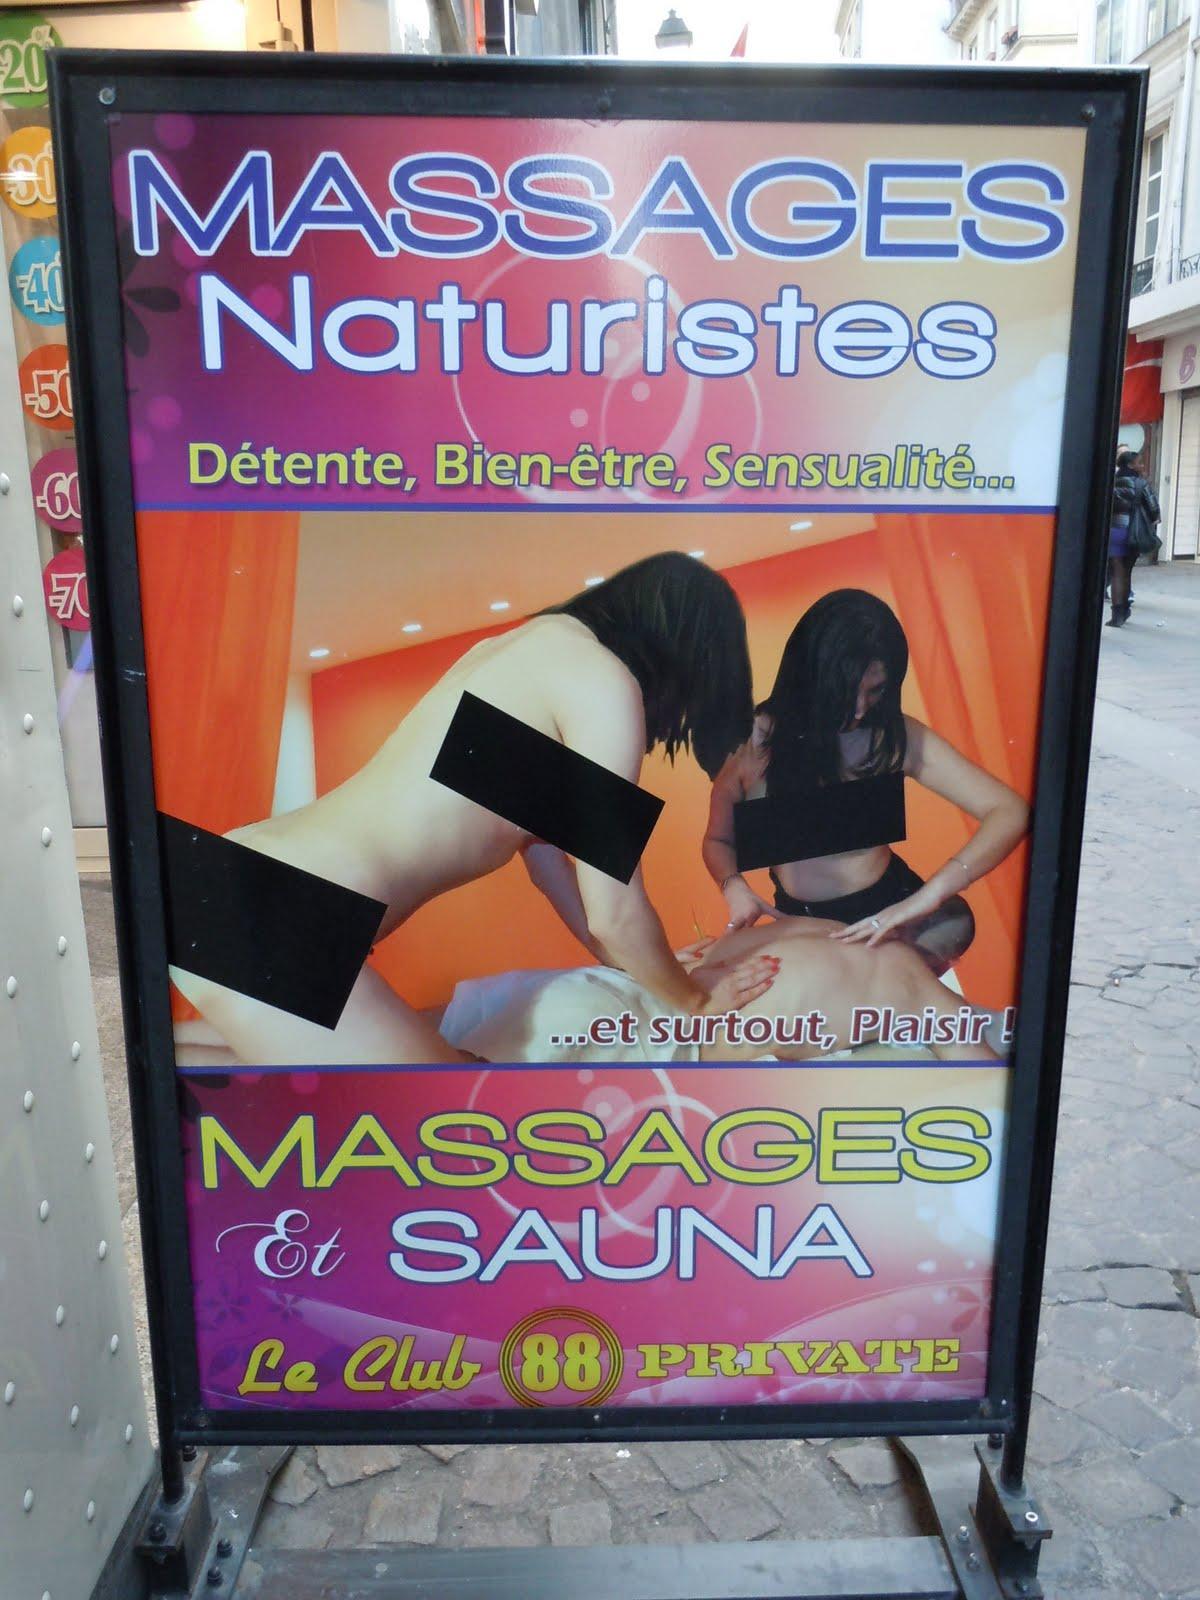 Nashville backpage therapeutic massage